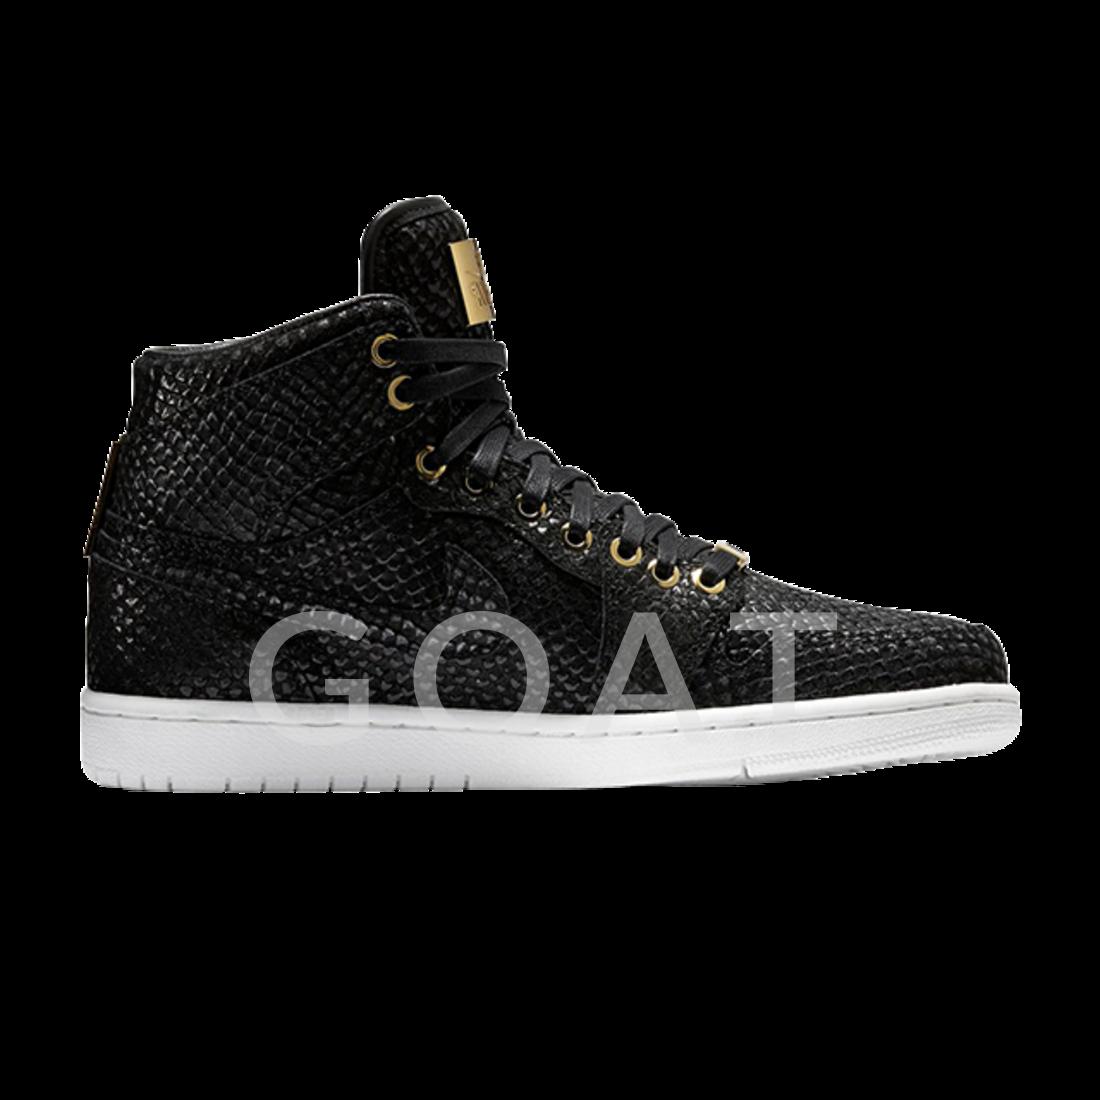 d38712b2ff9 Air Jordan 1 Retro High OG 'Pinnacle' - Air Jordan - 705075 030 - black/ black-metallic gold-white | GOAT